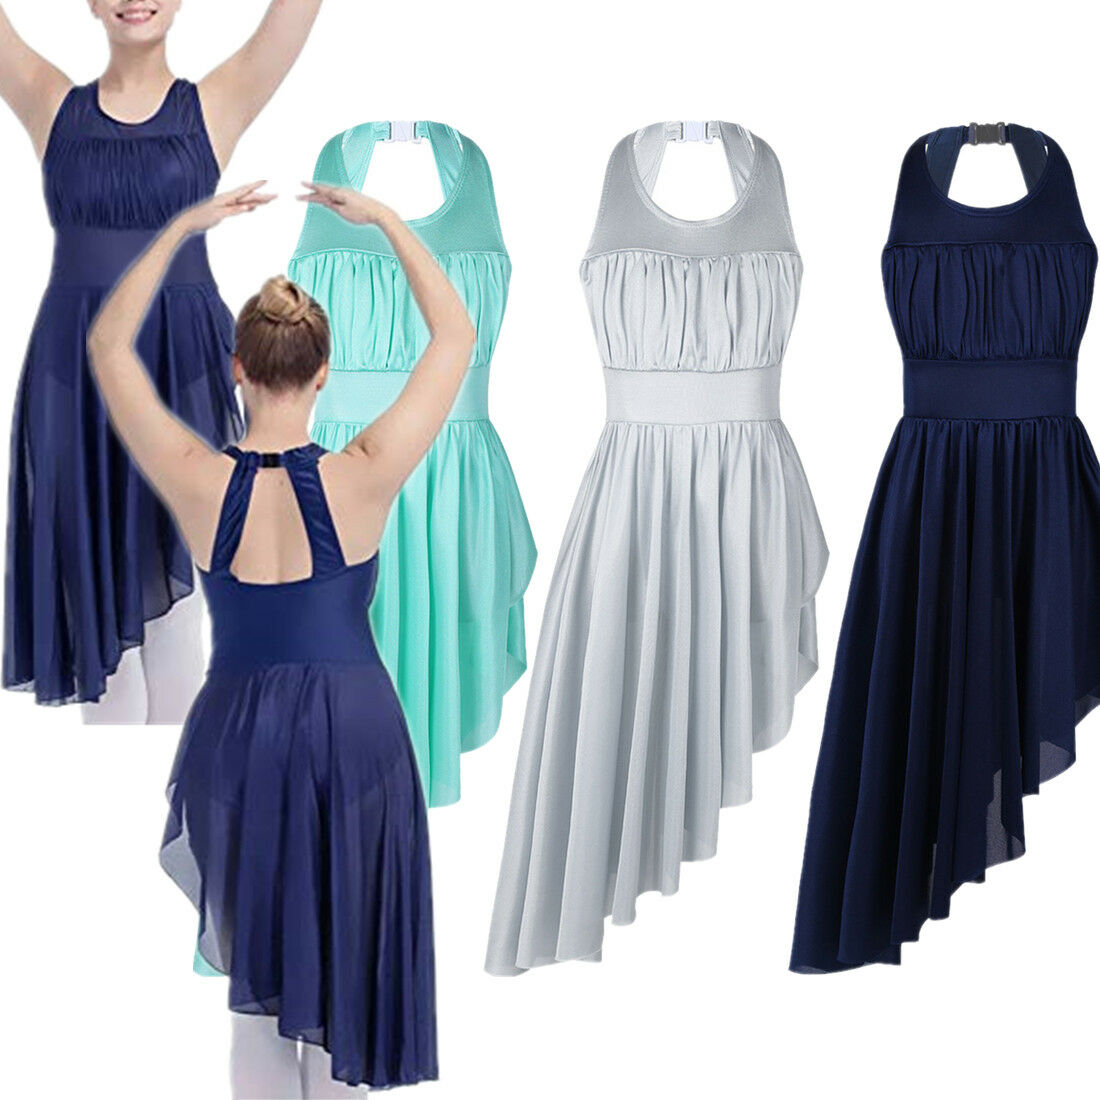 Adult Women Dancewear Costume Mesh Halter Lyrical Ballet Leotard Dance Dress XXL